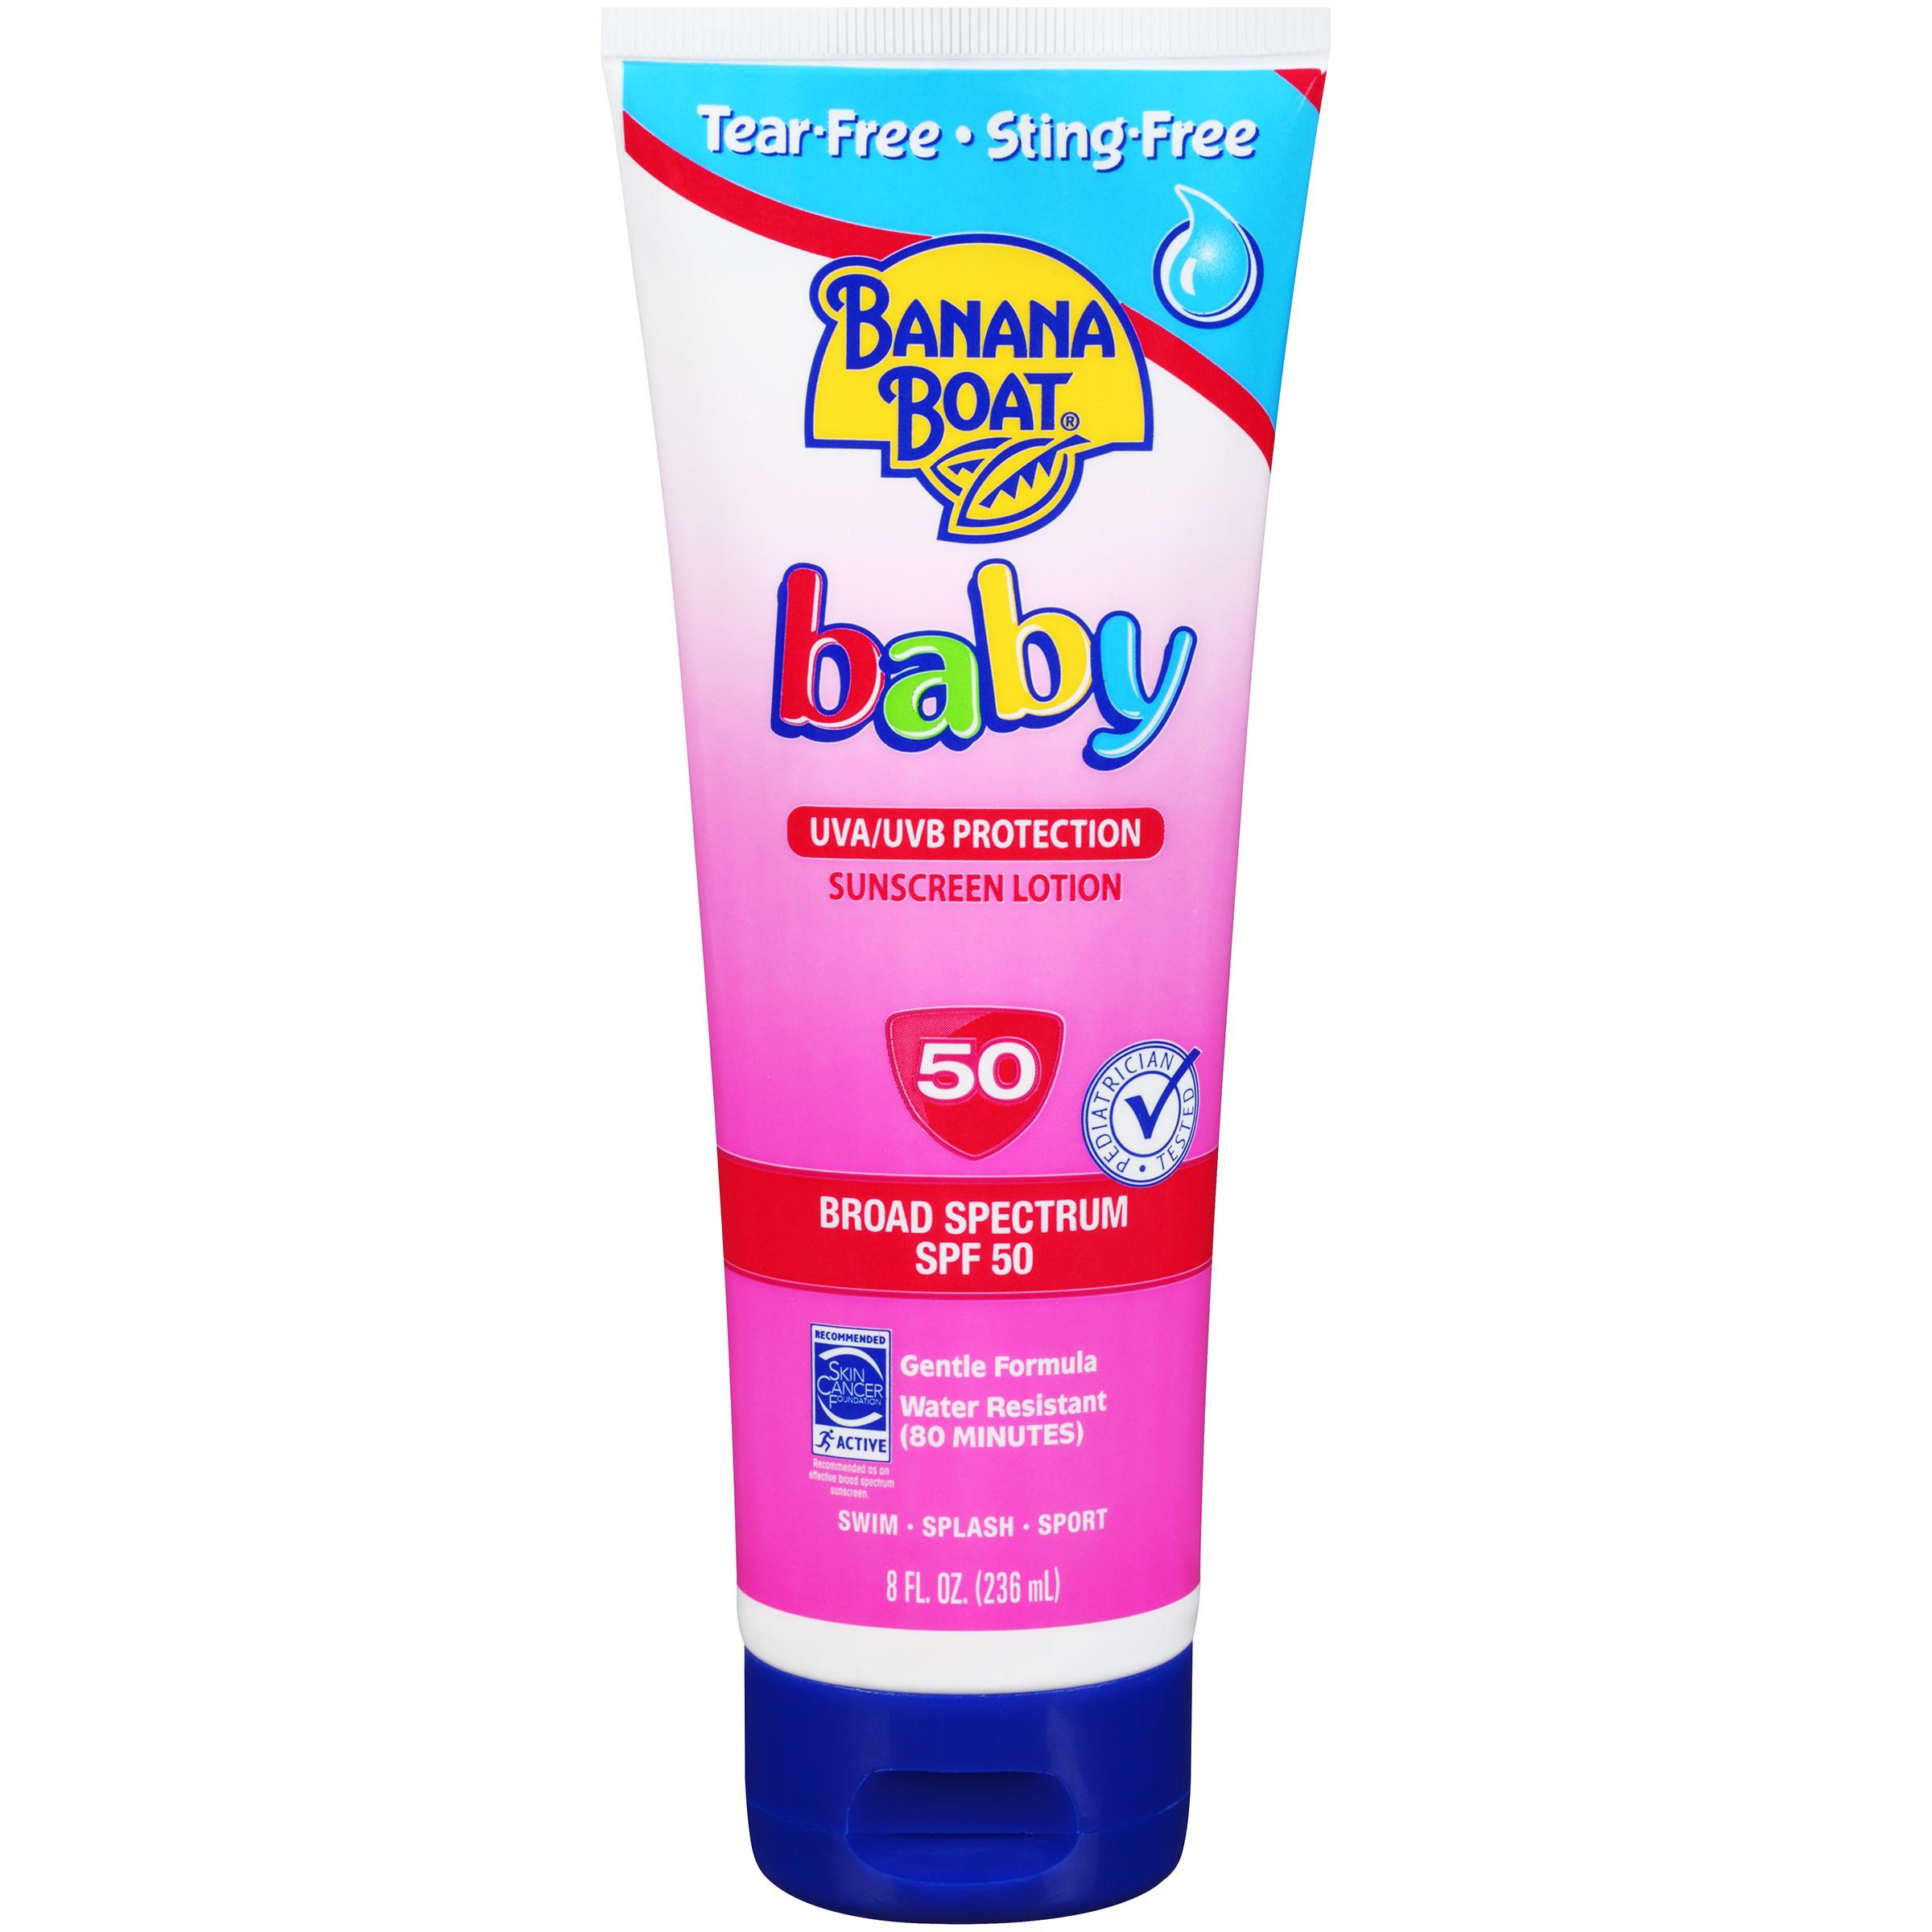 Baby Sunscreen Products Skin Deep Cosmetics Database Ewg Jafra Nourishing Hand Ampamp Nail Lotion Old Product Banana Boat Spf 50 2017 Formulation